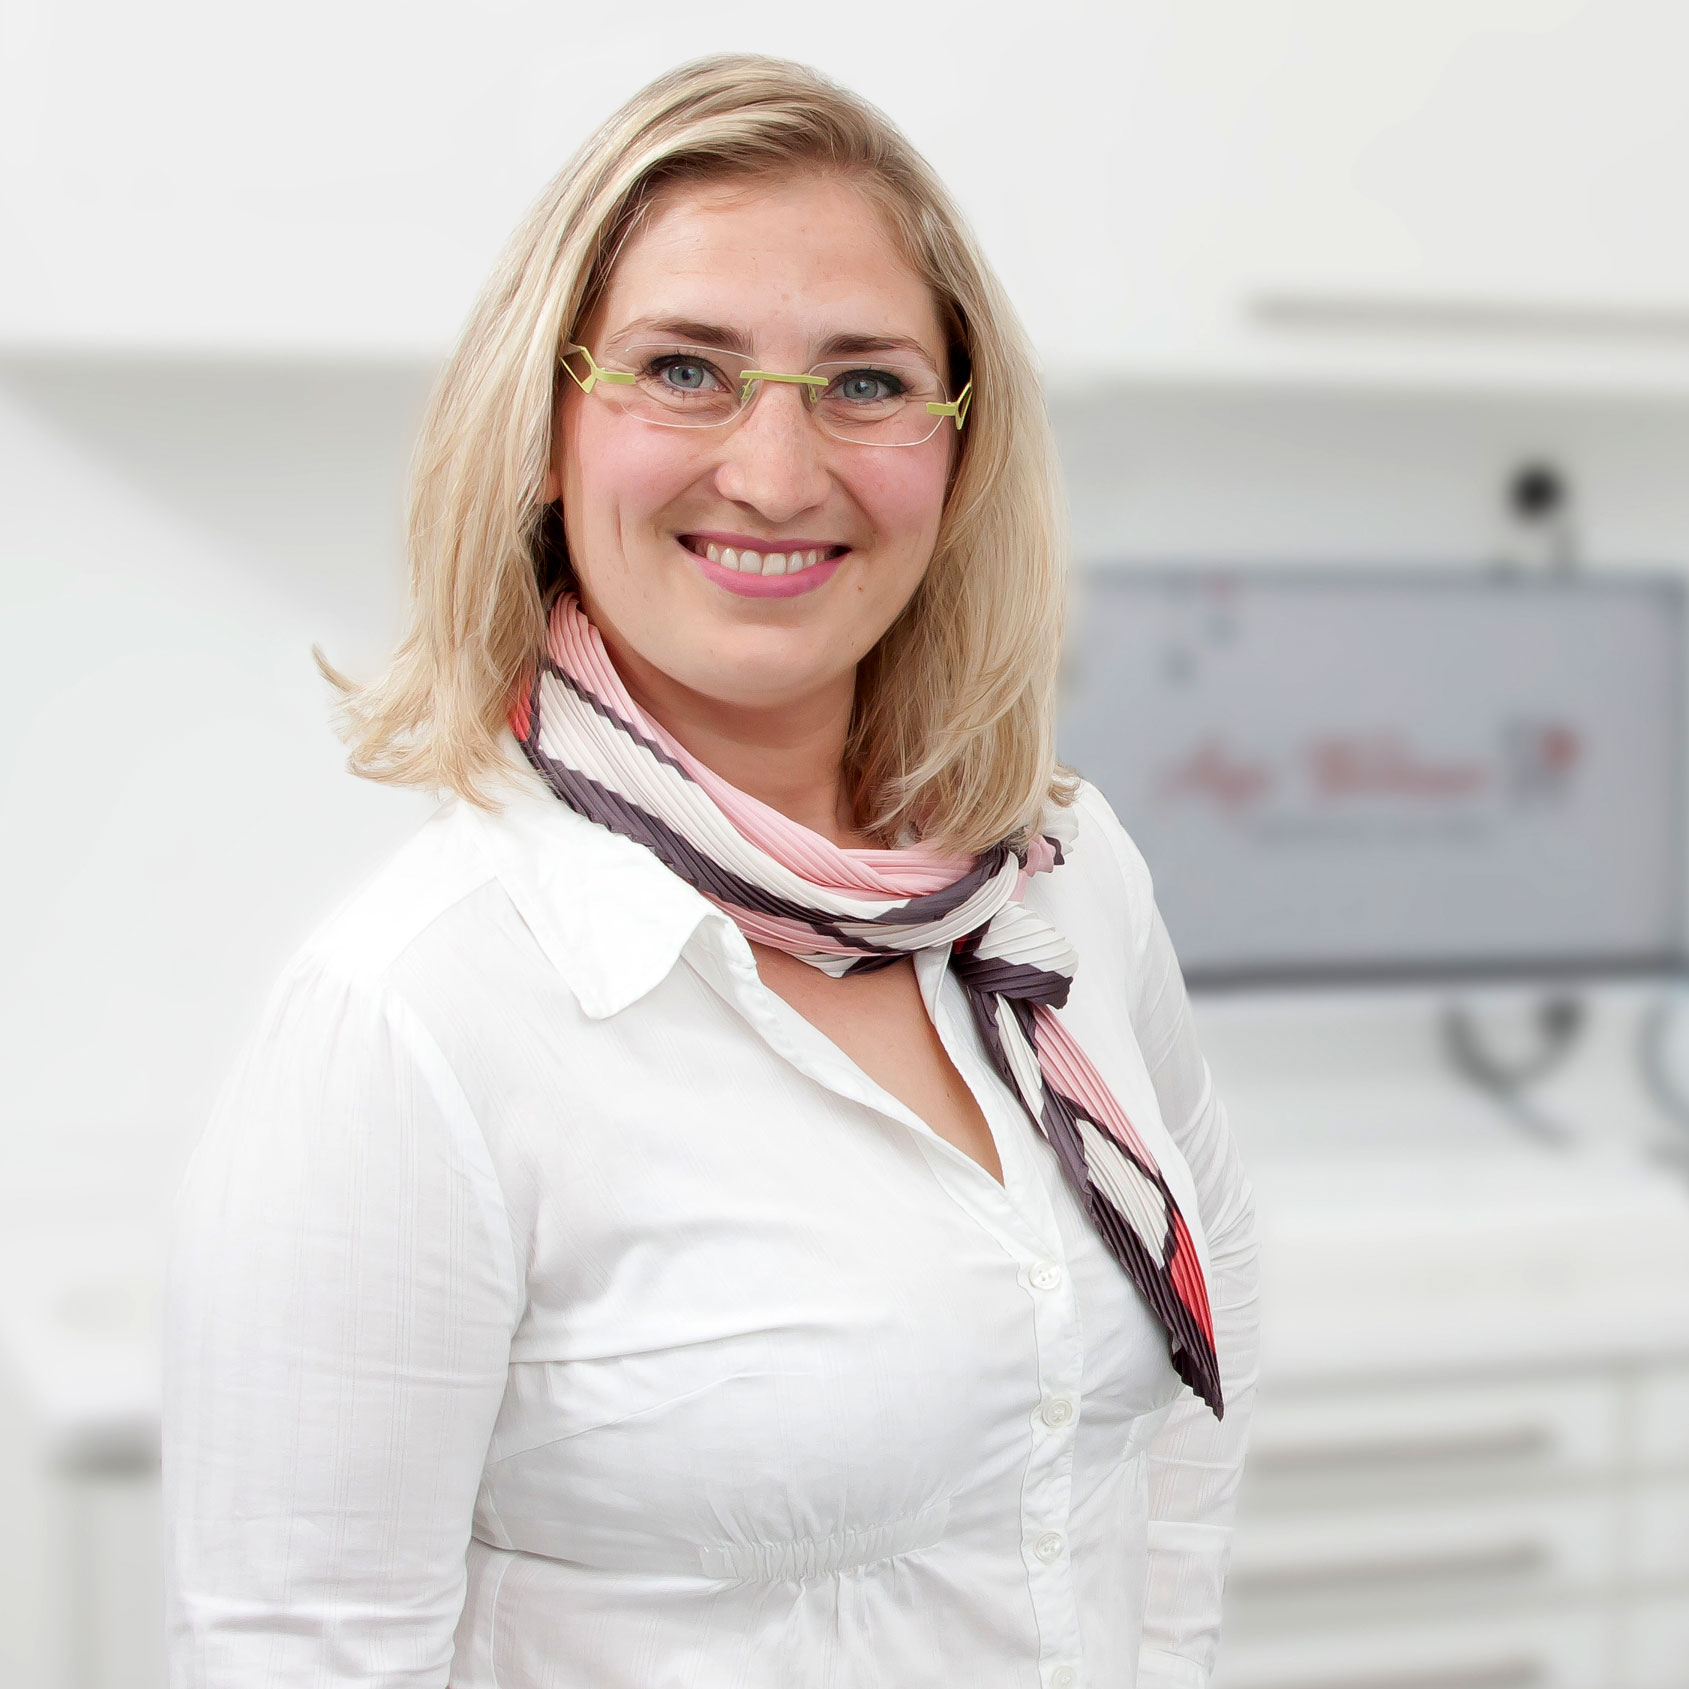 Zahnarzthelferin Nicole